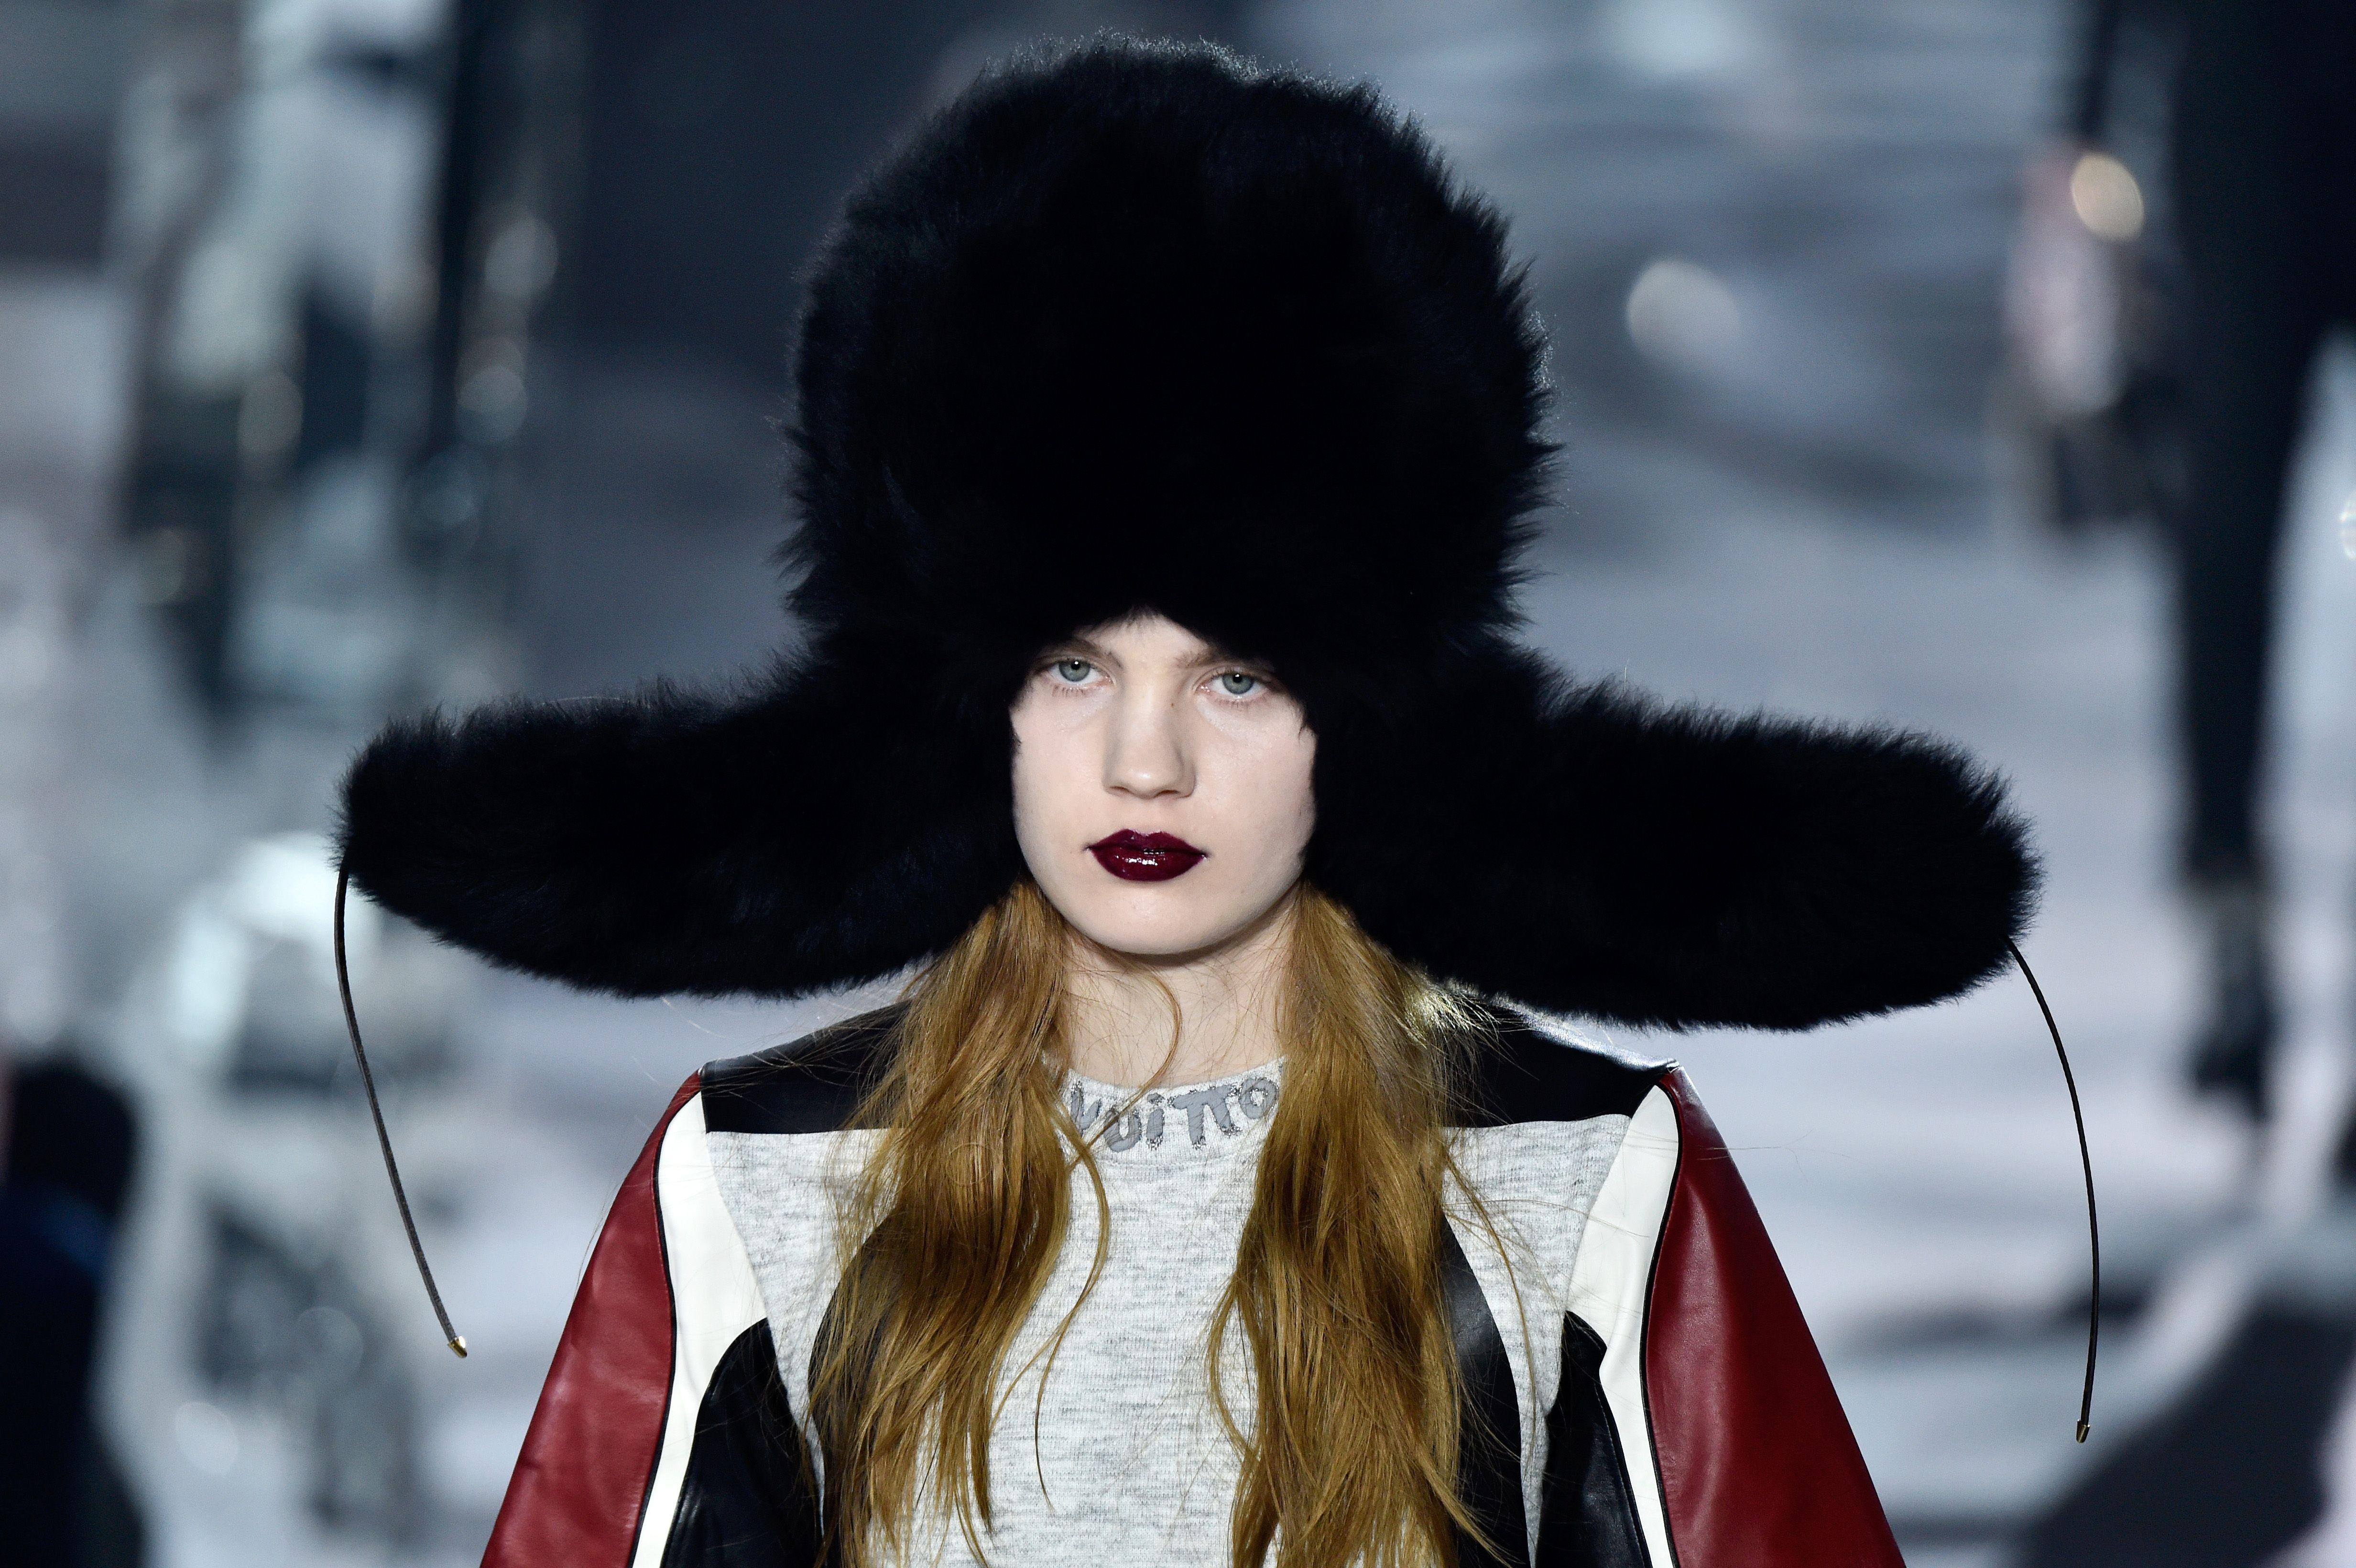 019fcddb67 10 Best Winter Fashion Trends - 10 Most Wearable Winter Fashion Looks